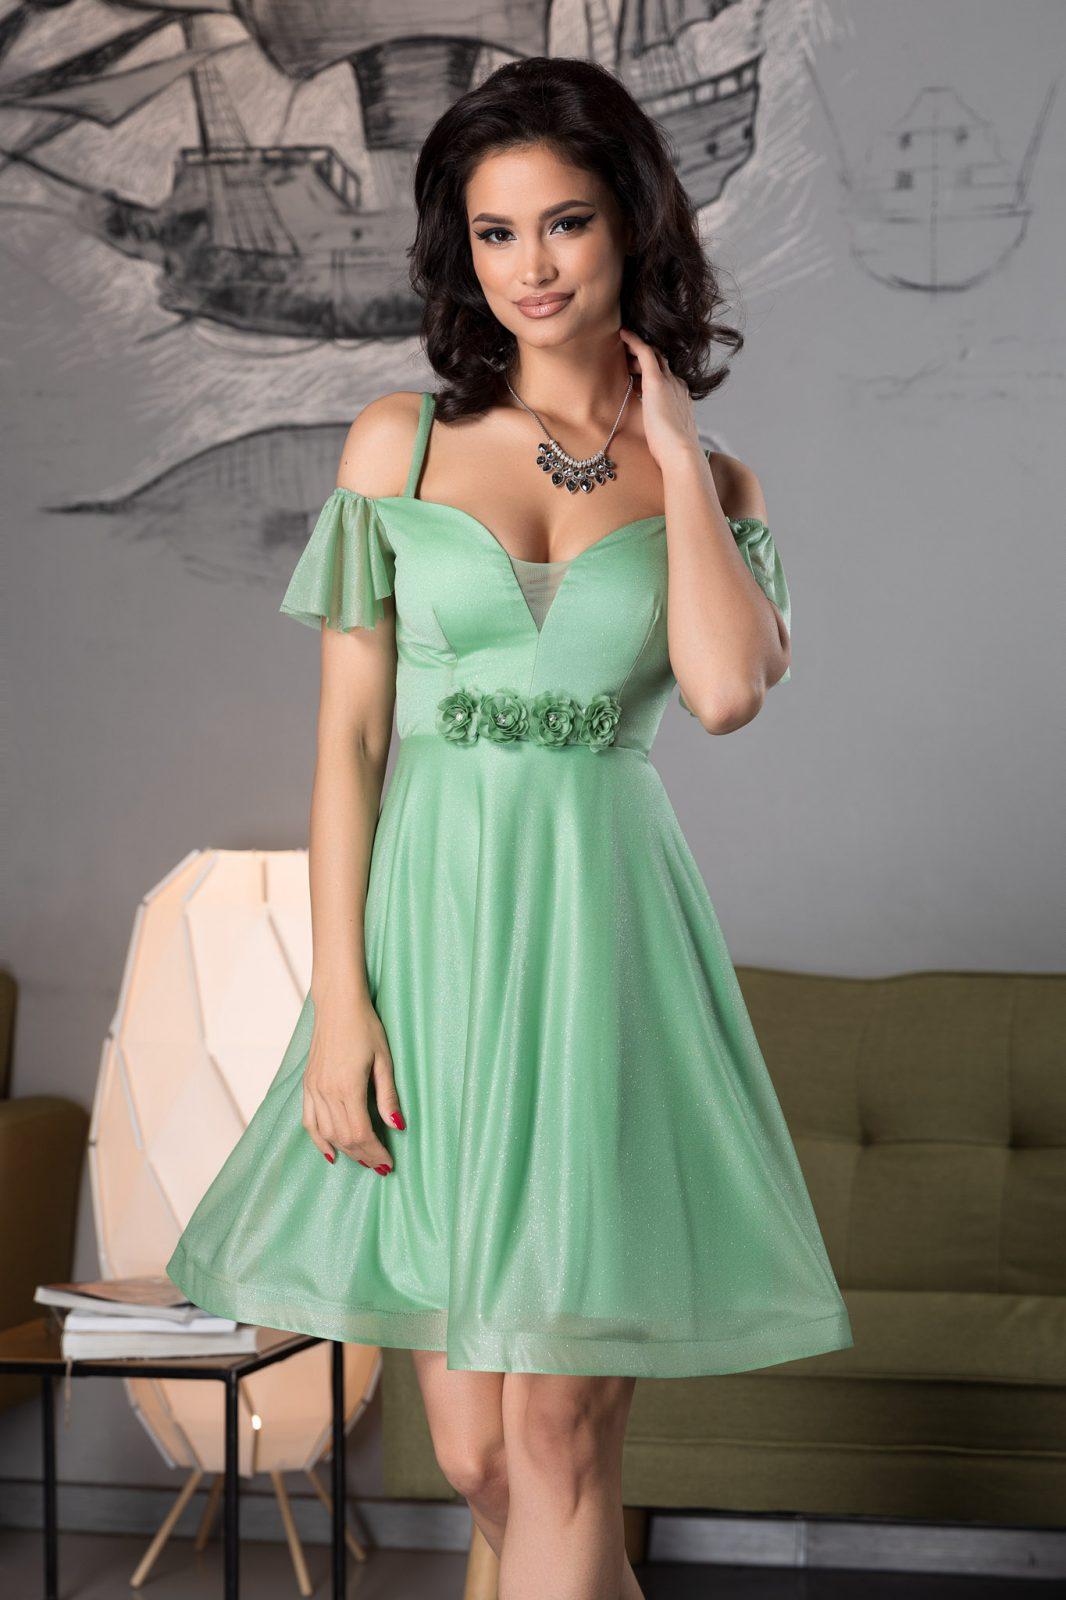 Sonique Green Dress